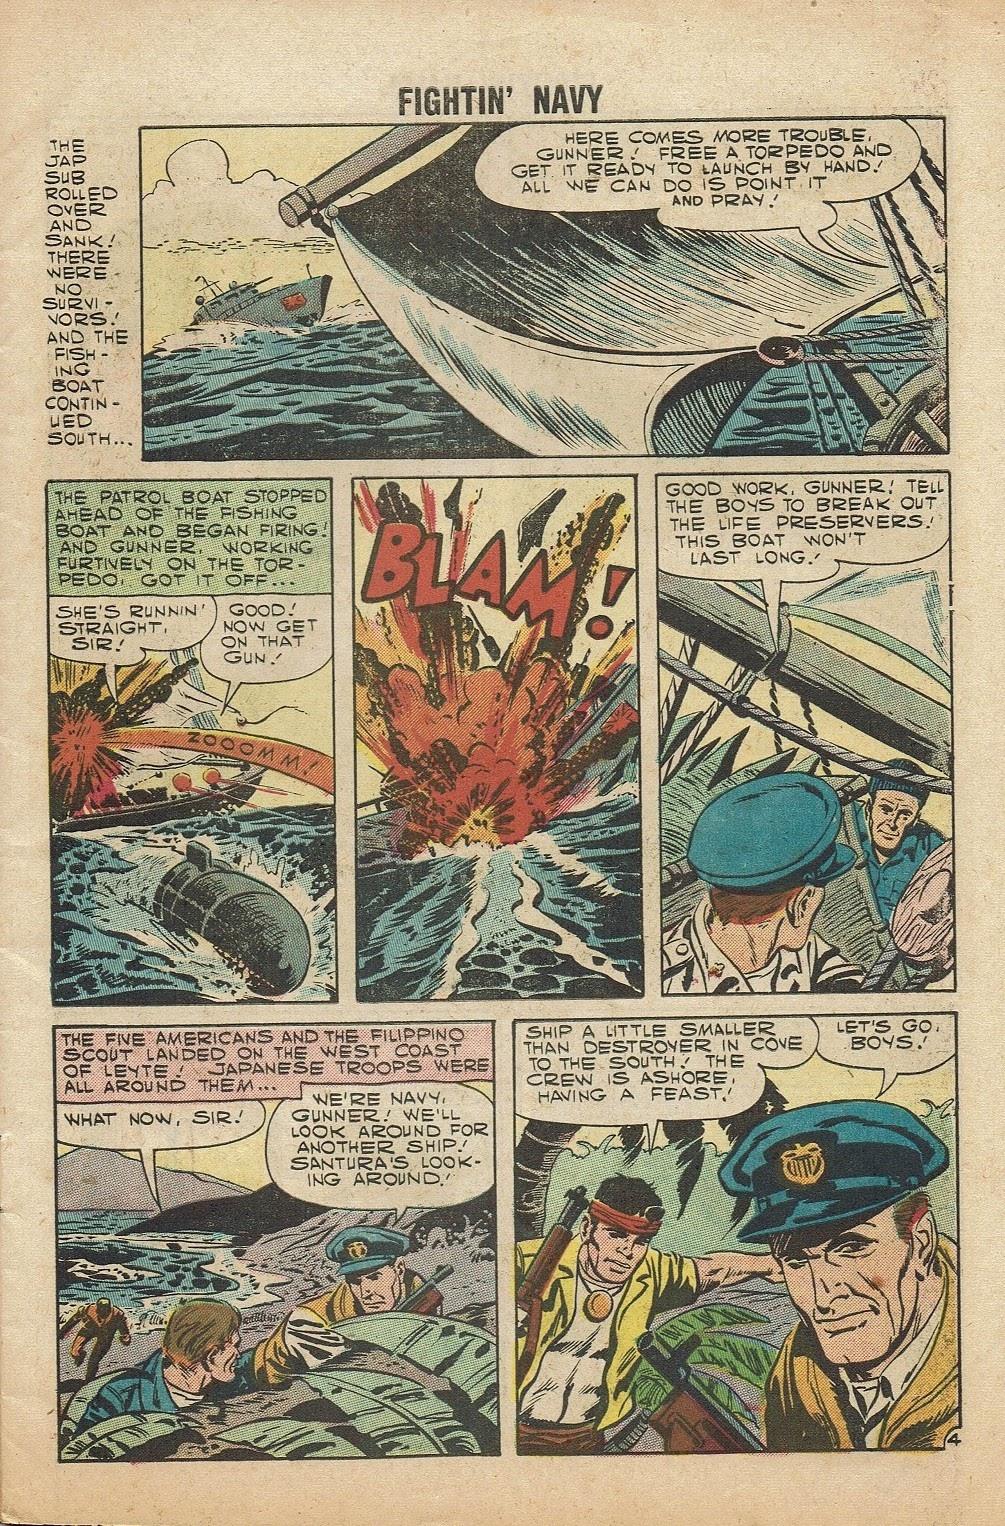 Read online Fightin' Navy comic -  Issue #81 - 7